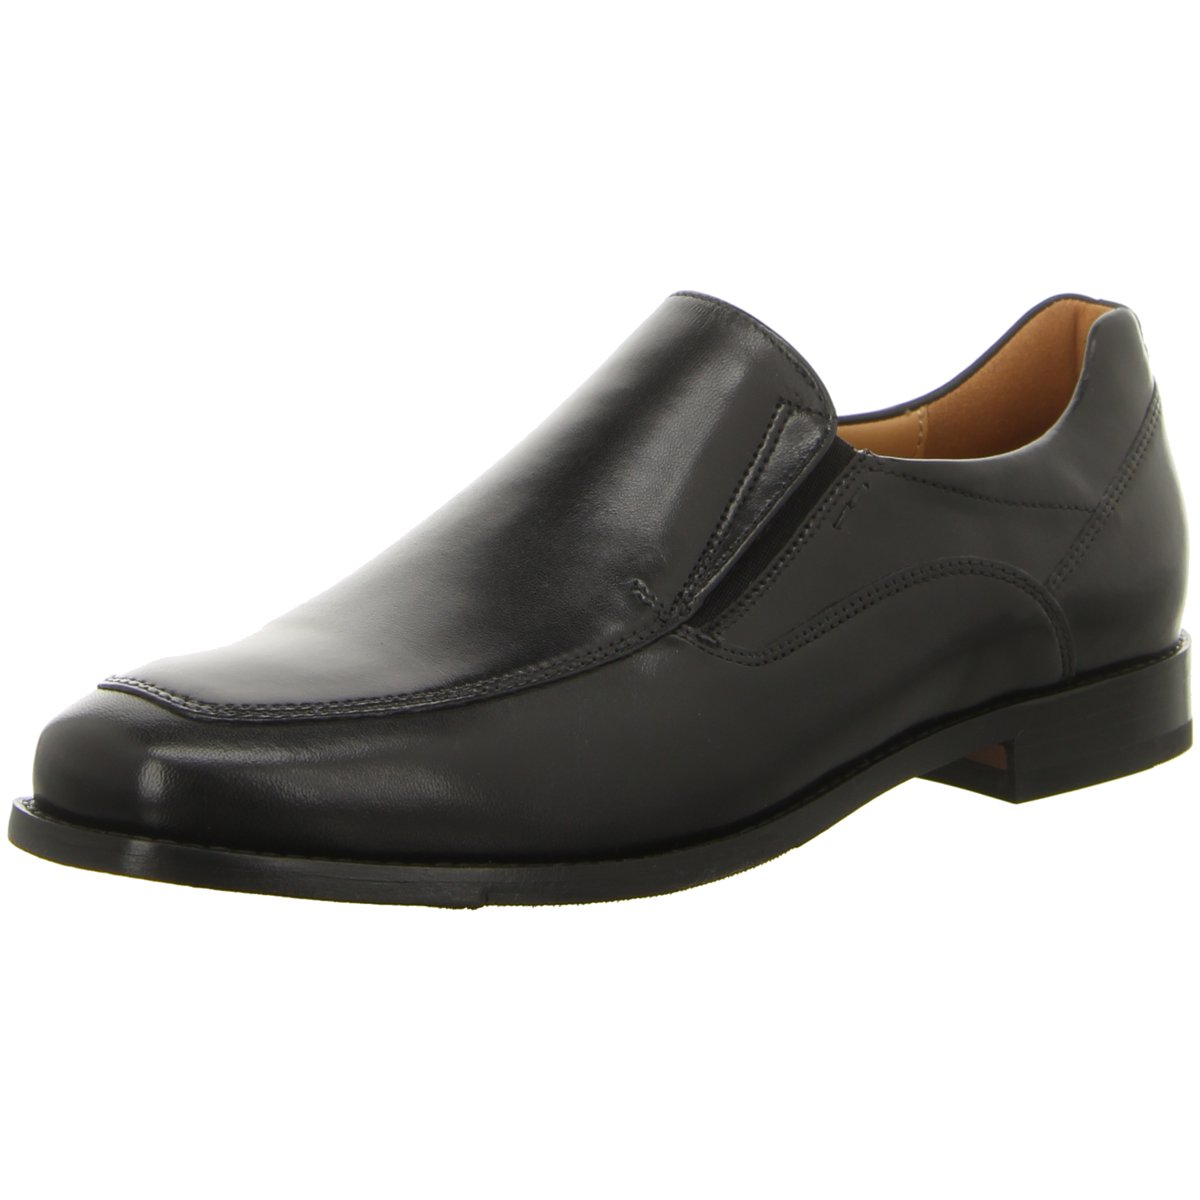 Ara Herren Business Chris,K,schwarz 32502-01 schwarz schwarz schwarz 280157    072d13